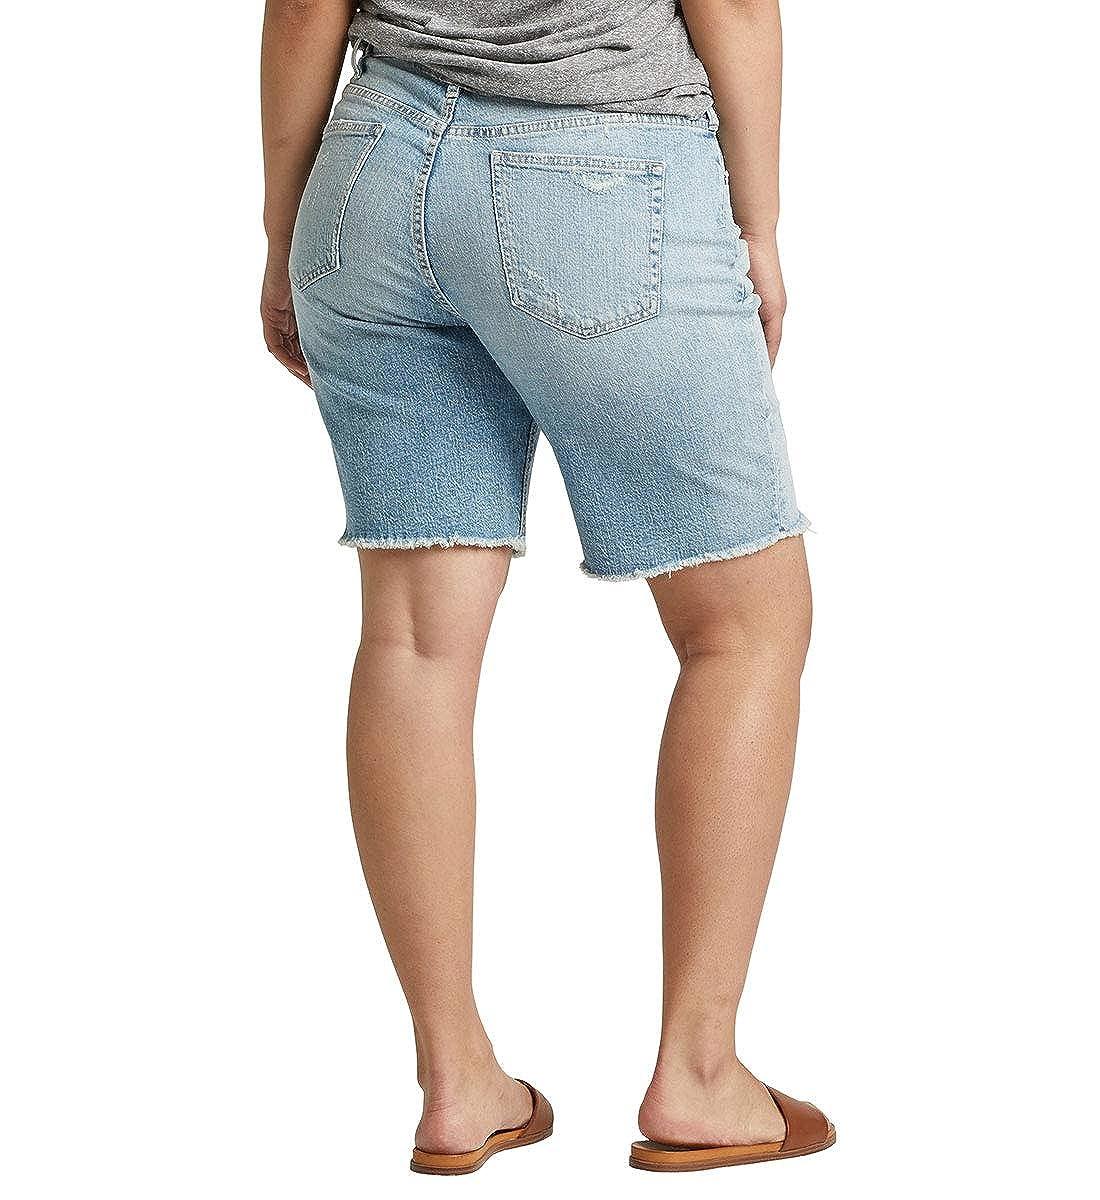 Silver Jeans Co Womens Plus Size Frisco High-Rise Vintage Knee Short